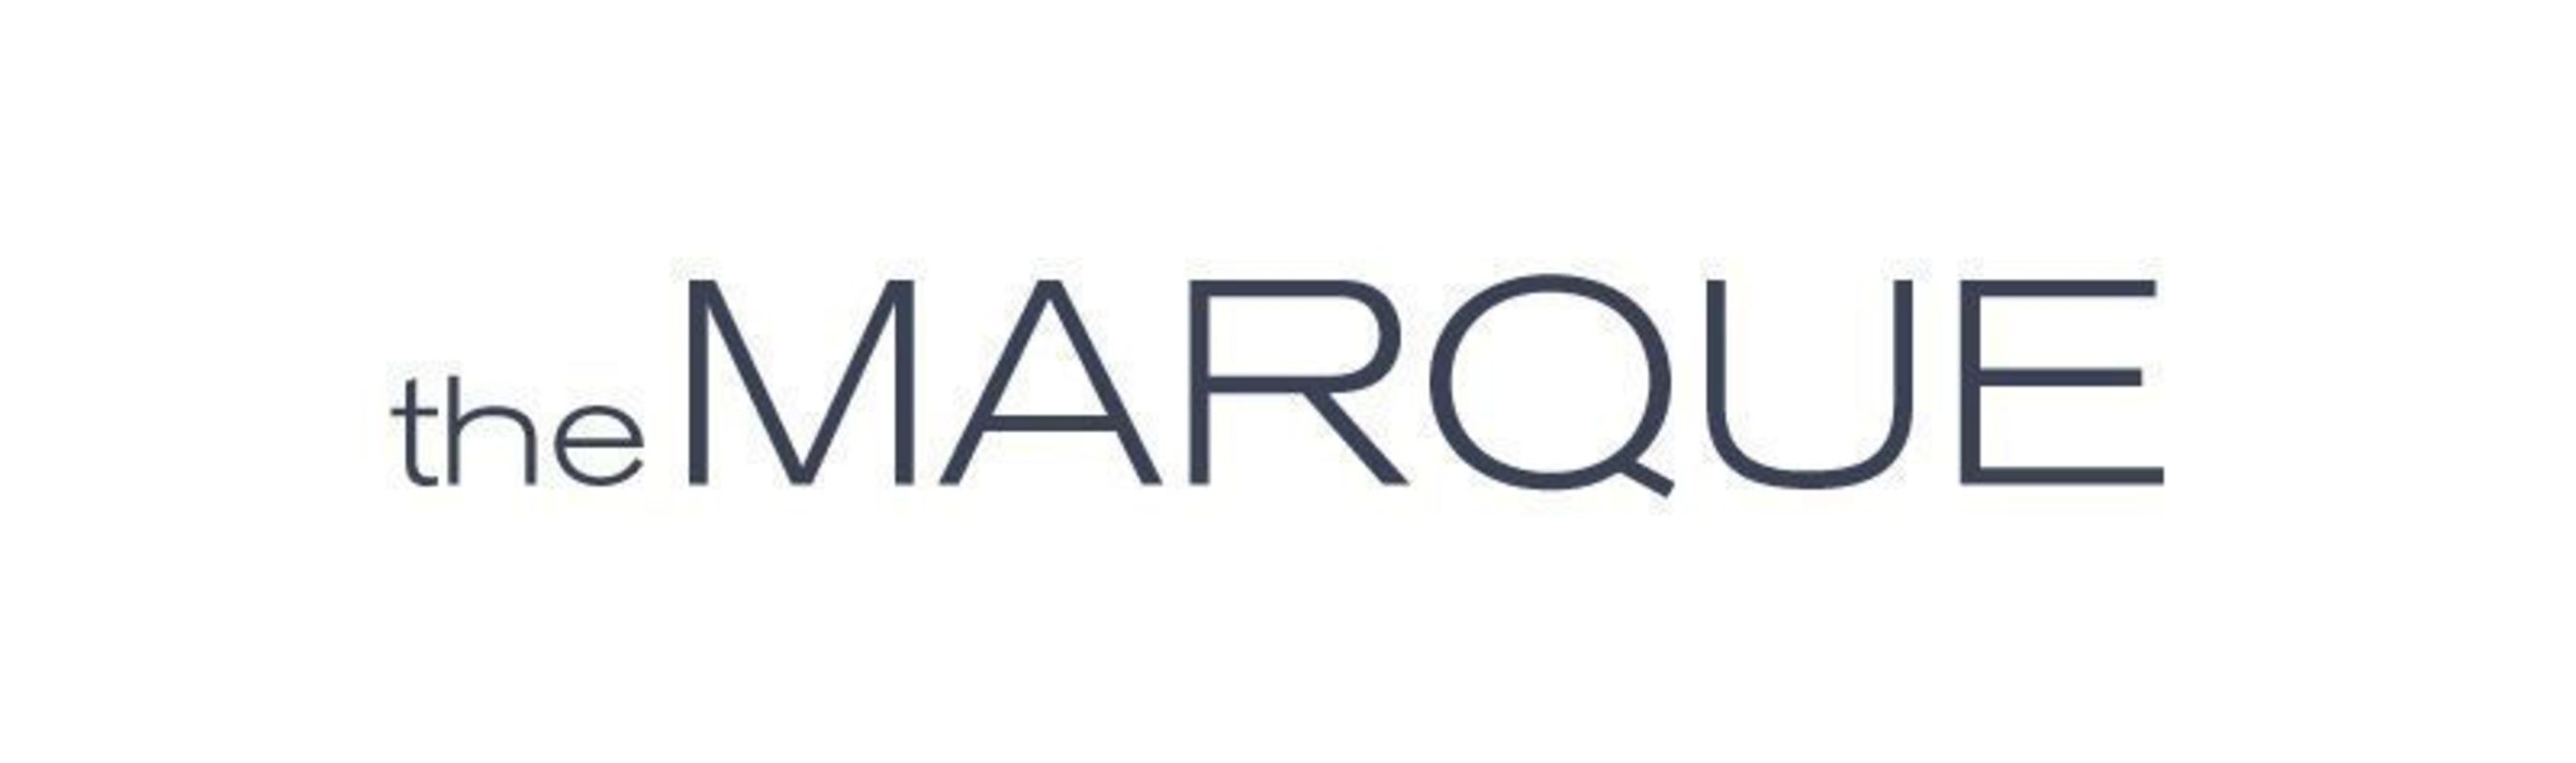 The Marque Logo (PRNewsFoto/The Marque)